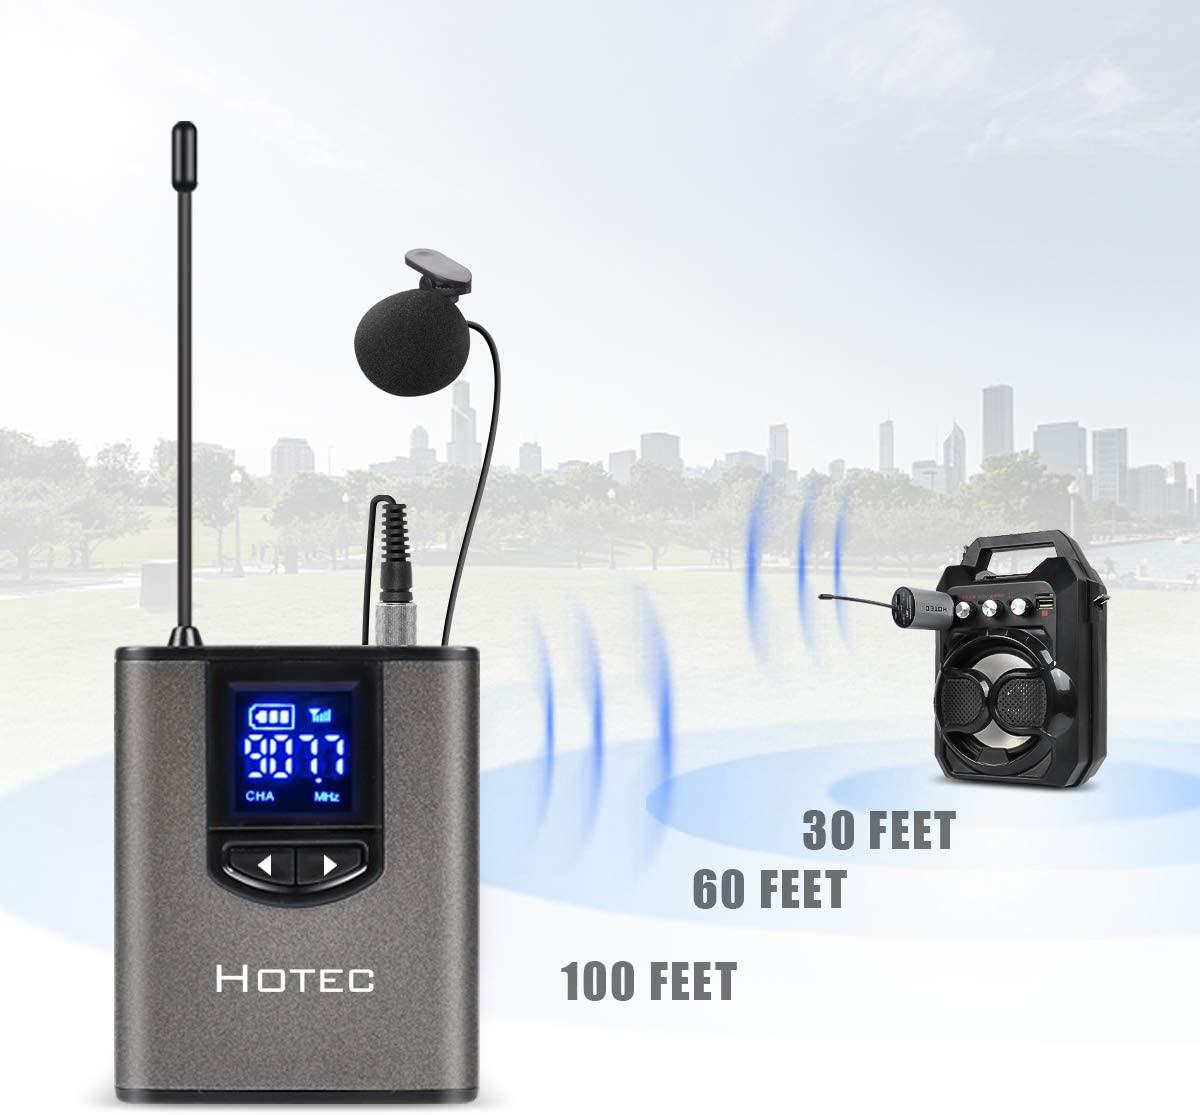 Hotec-Lavalier—Micrófono-inalámbrico-para-grabación